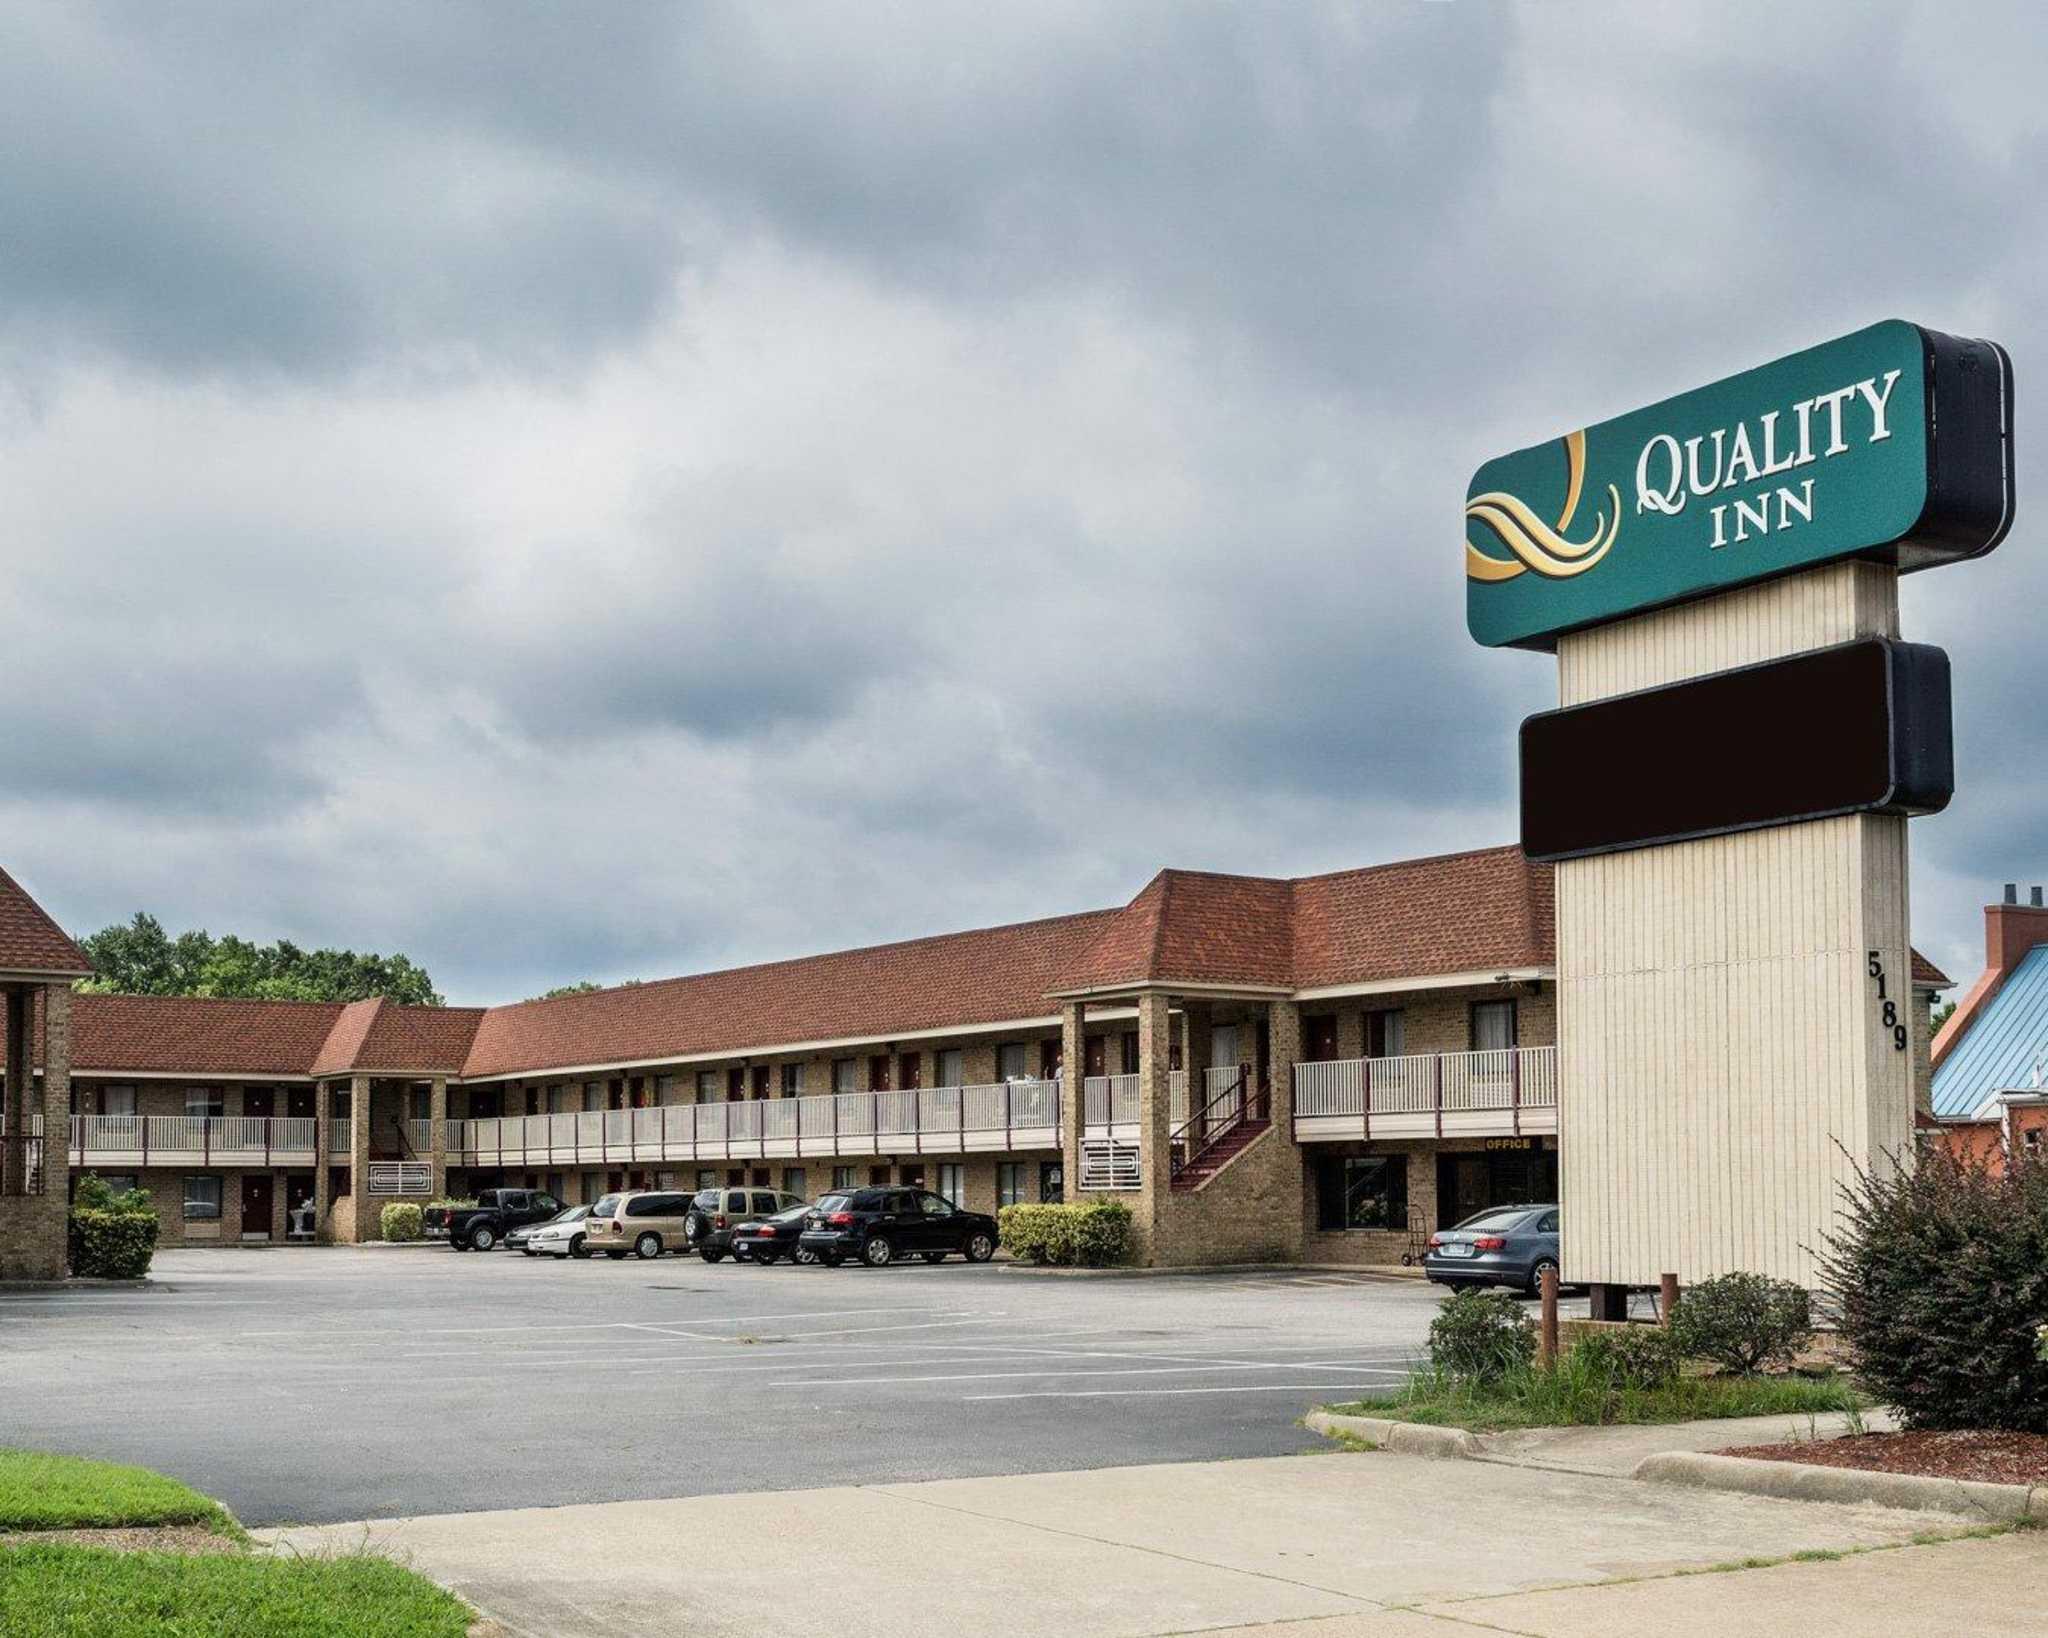 Quality Inn Little Creek